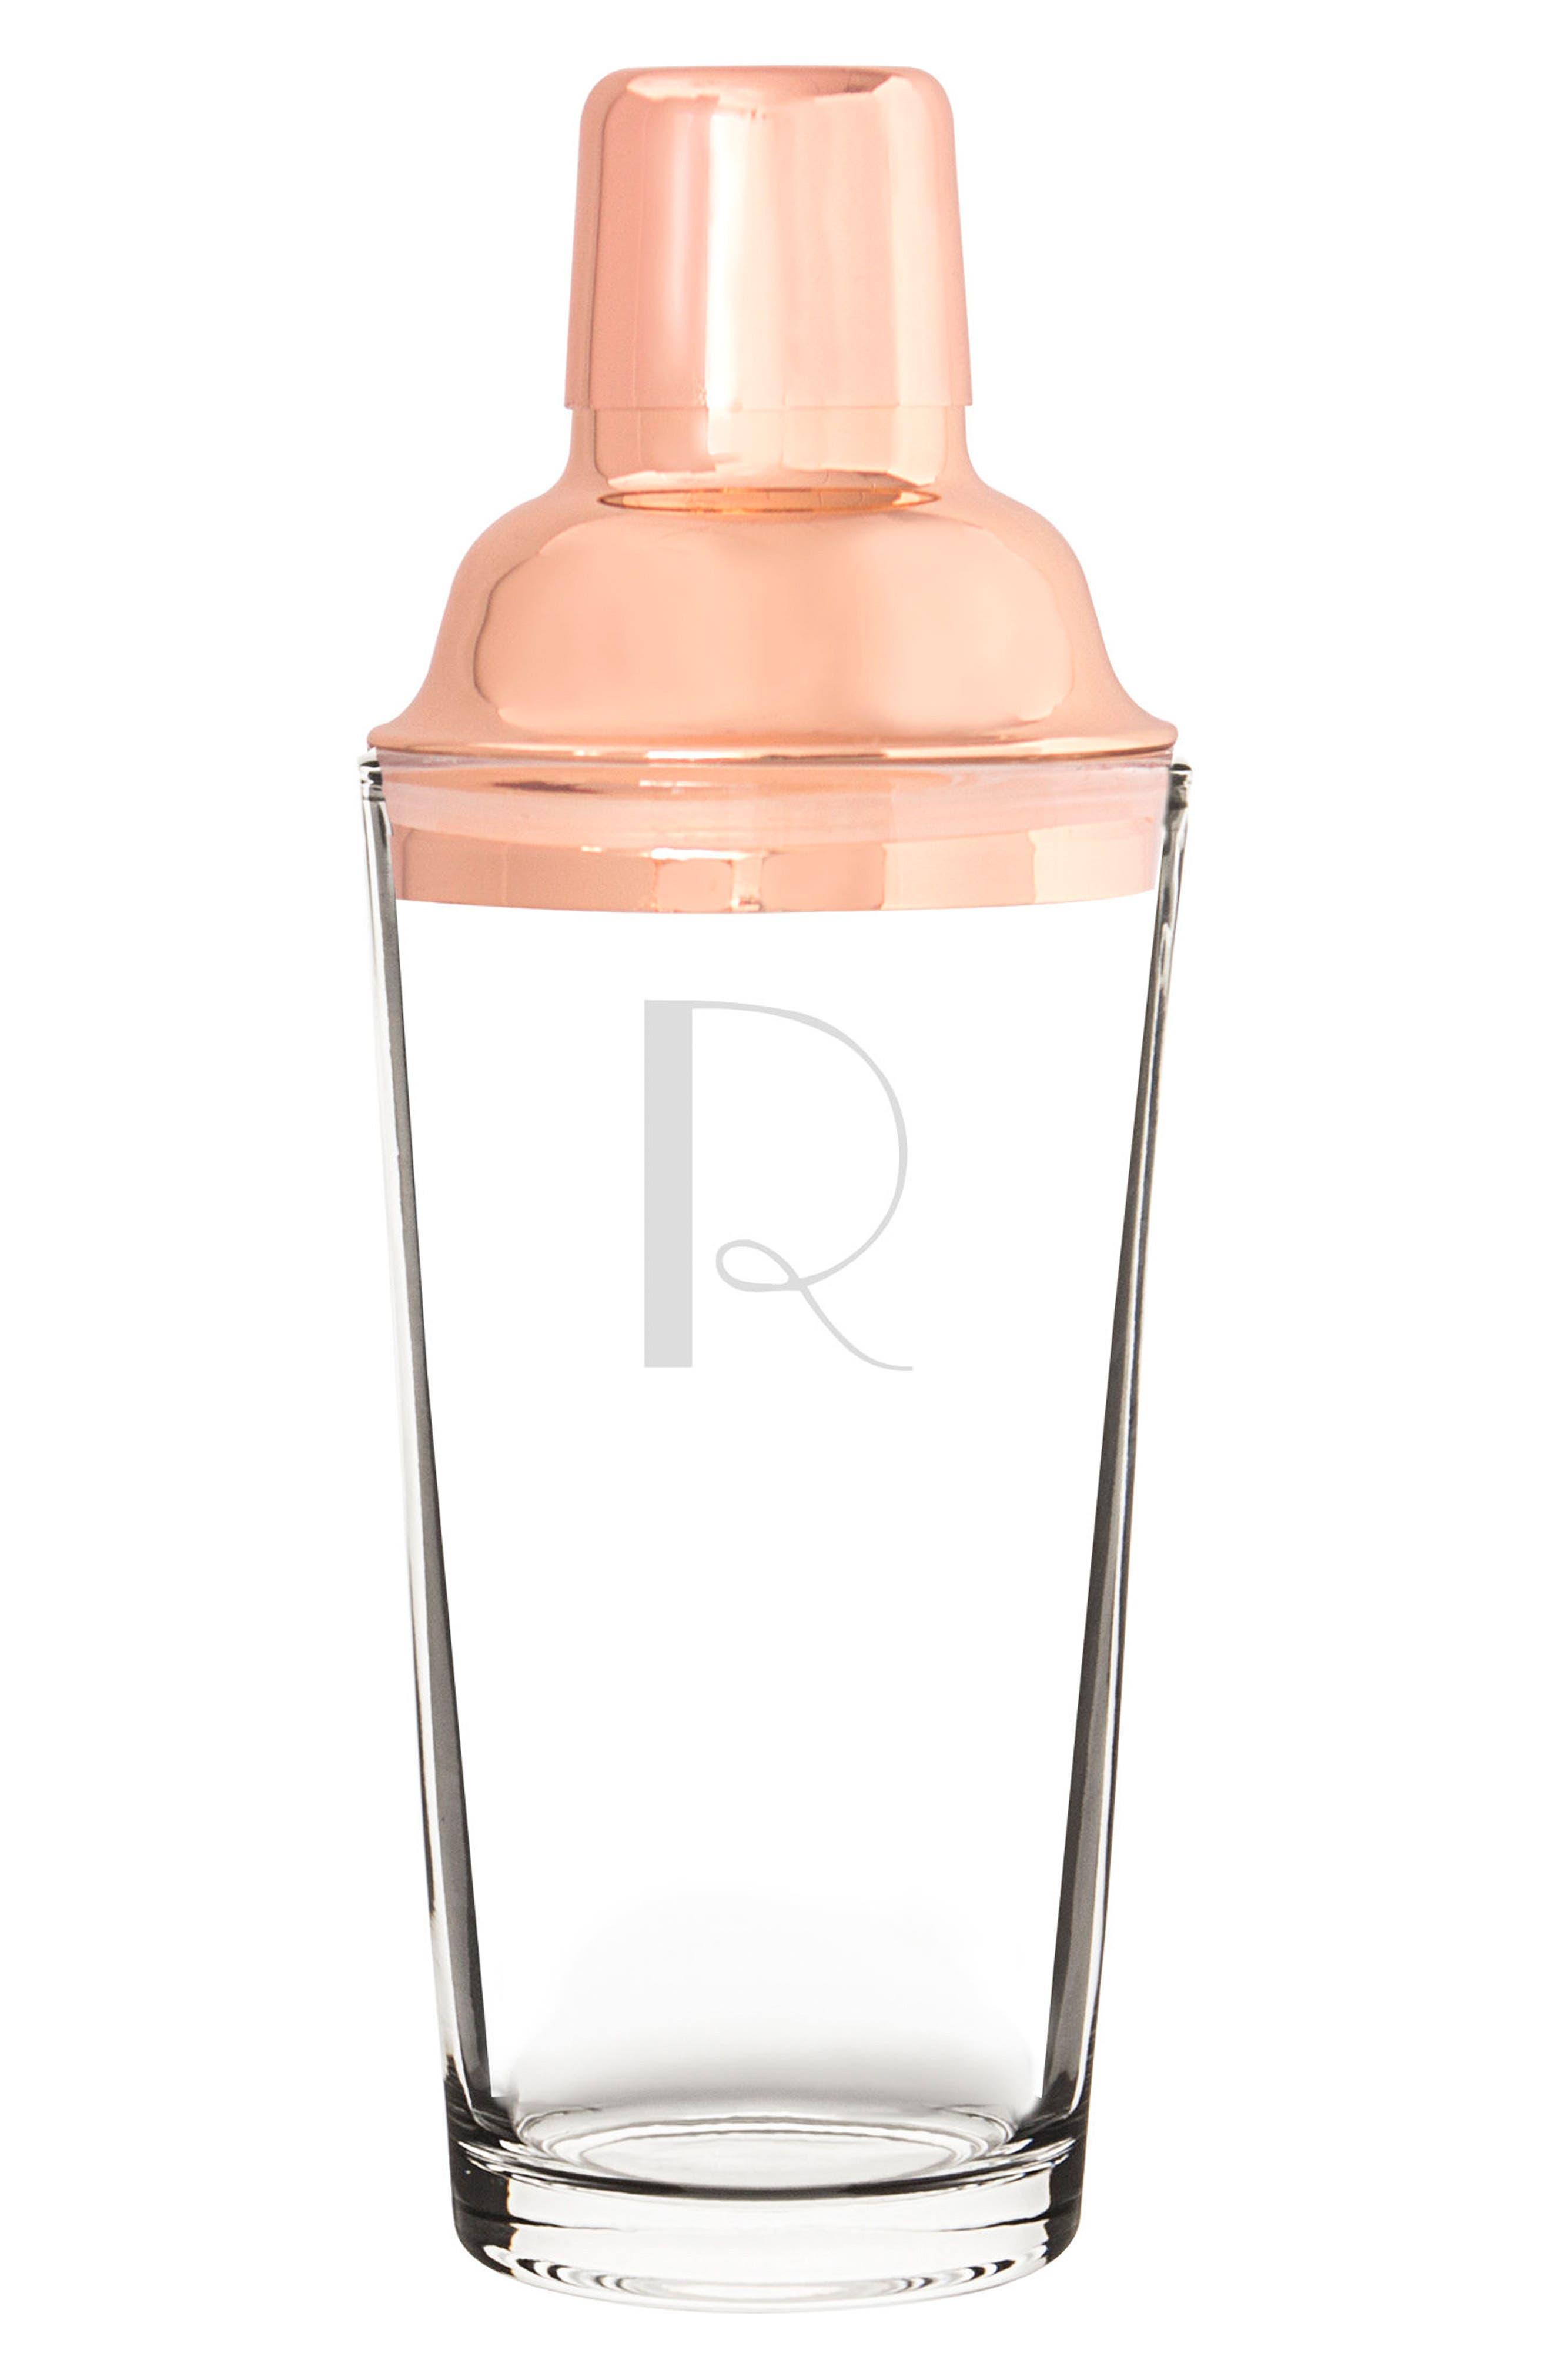 Monogram Coppertone Cocktail Shaker,                             Main thumbnail 19, color,